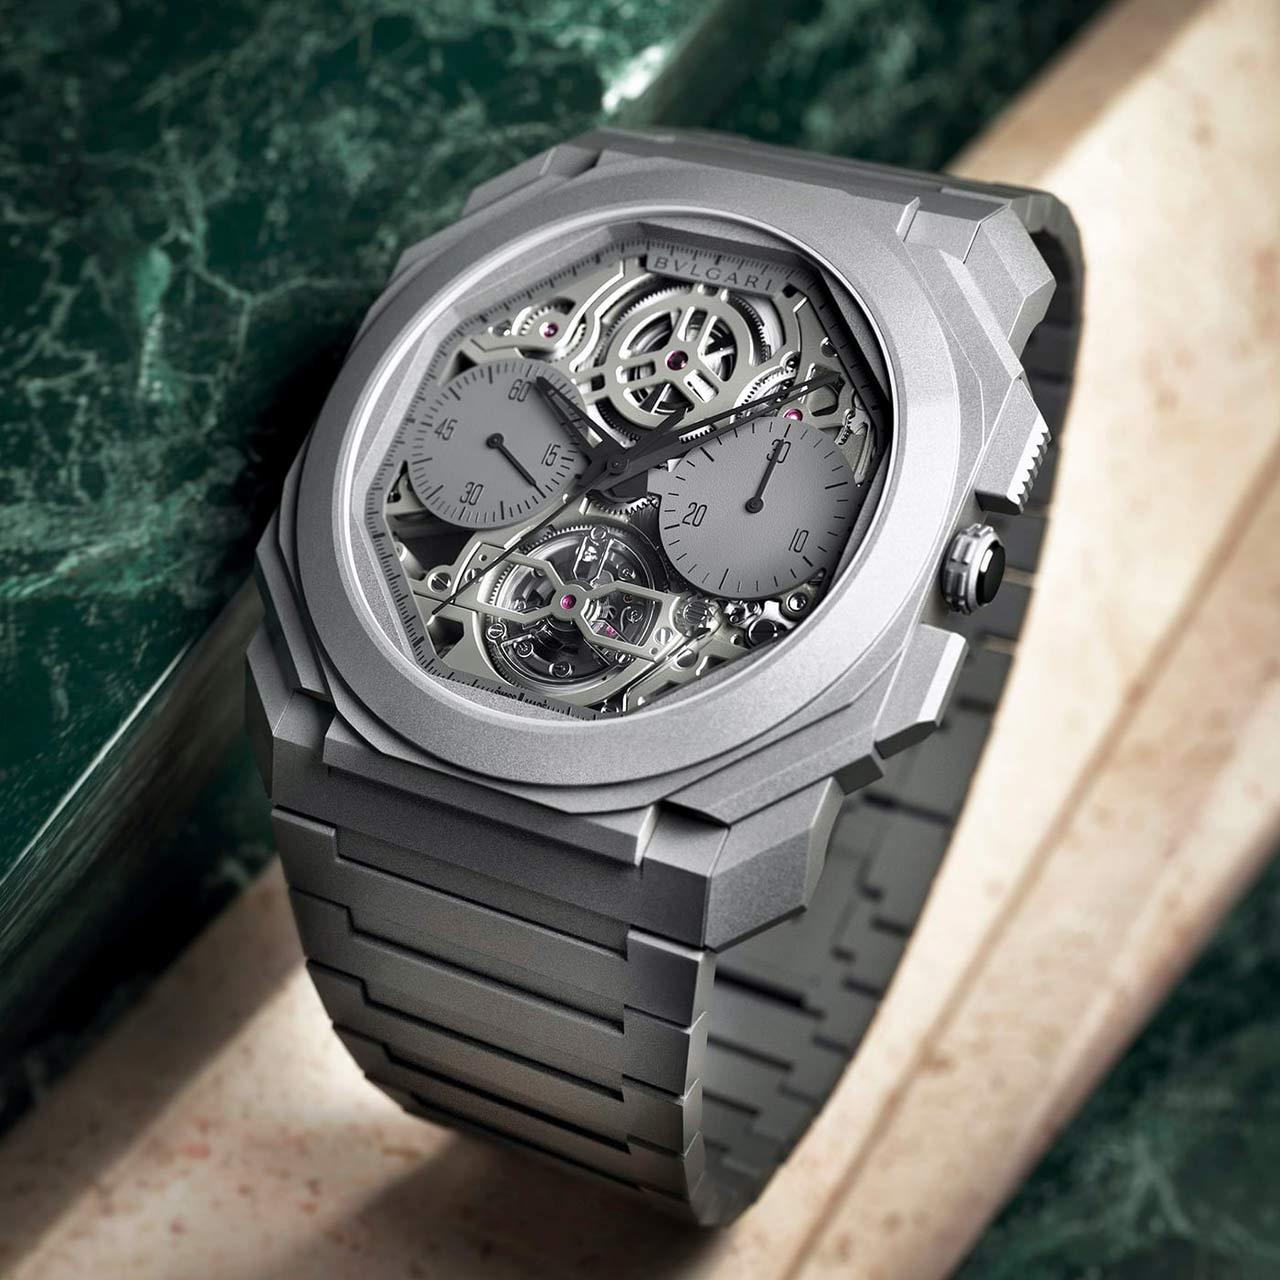 INTRODUCING: The breathtaking and brutally slim Bulgari Octo Finissimo Tourbillon Chronograph Skeleton Automatic